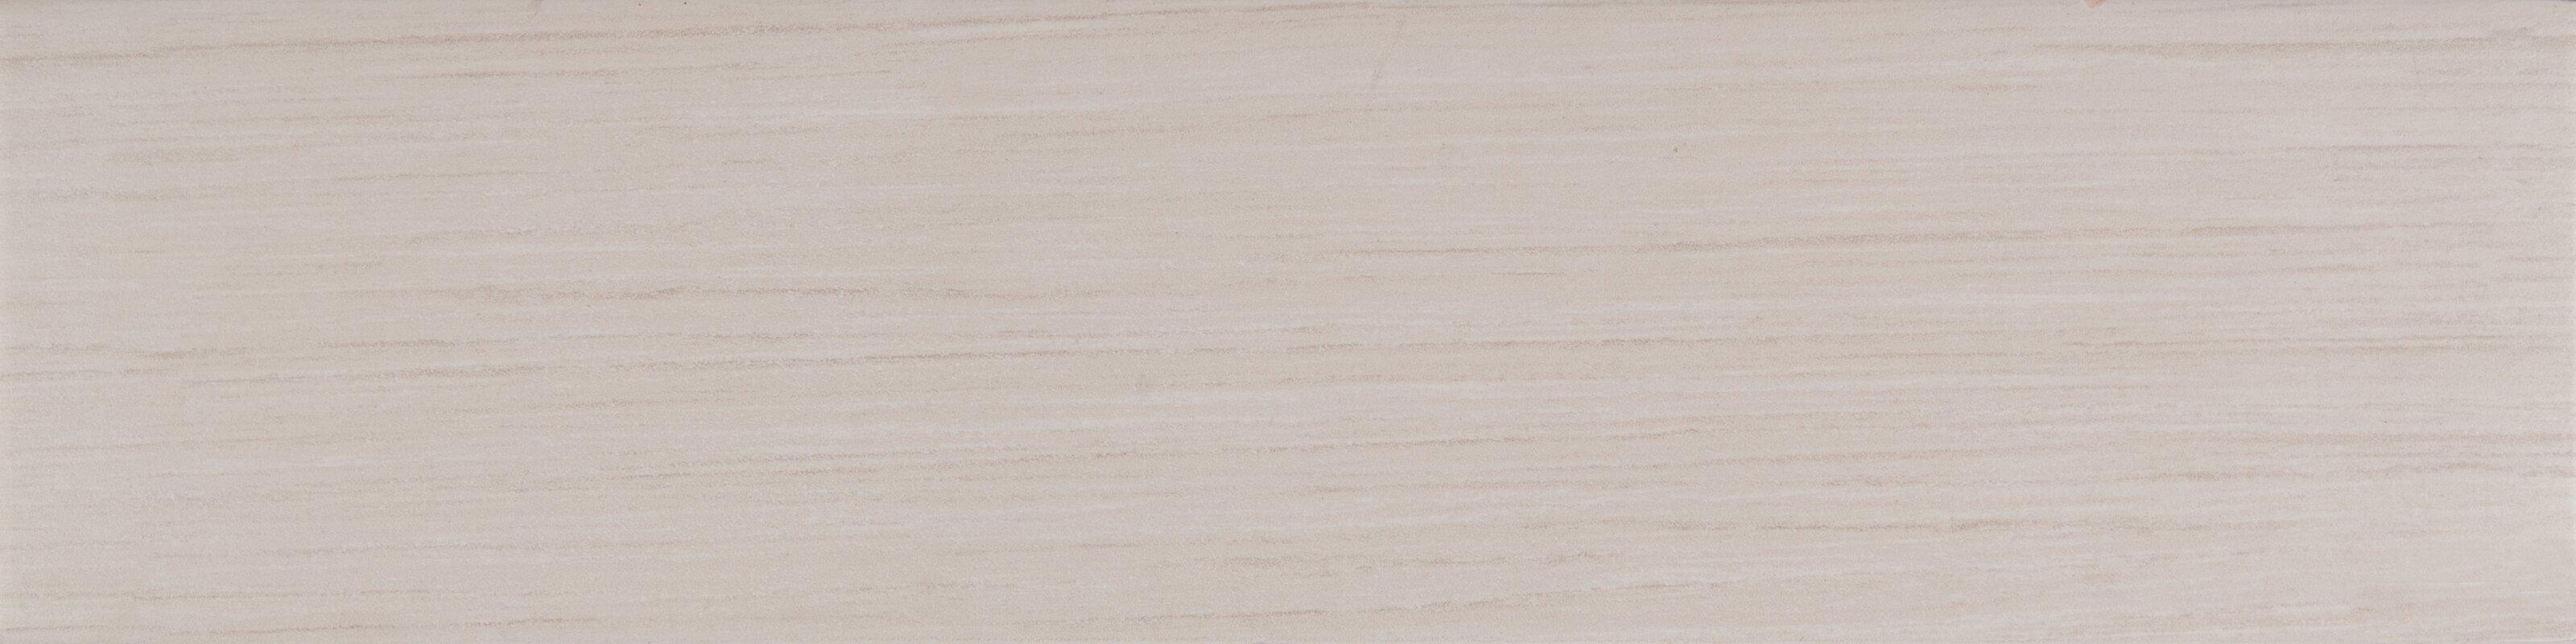 Sygma Ice 6 X 24 Ceramic Wood Look Tile